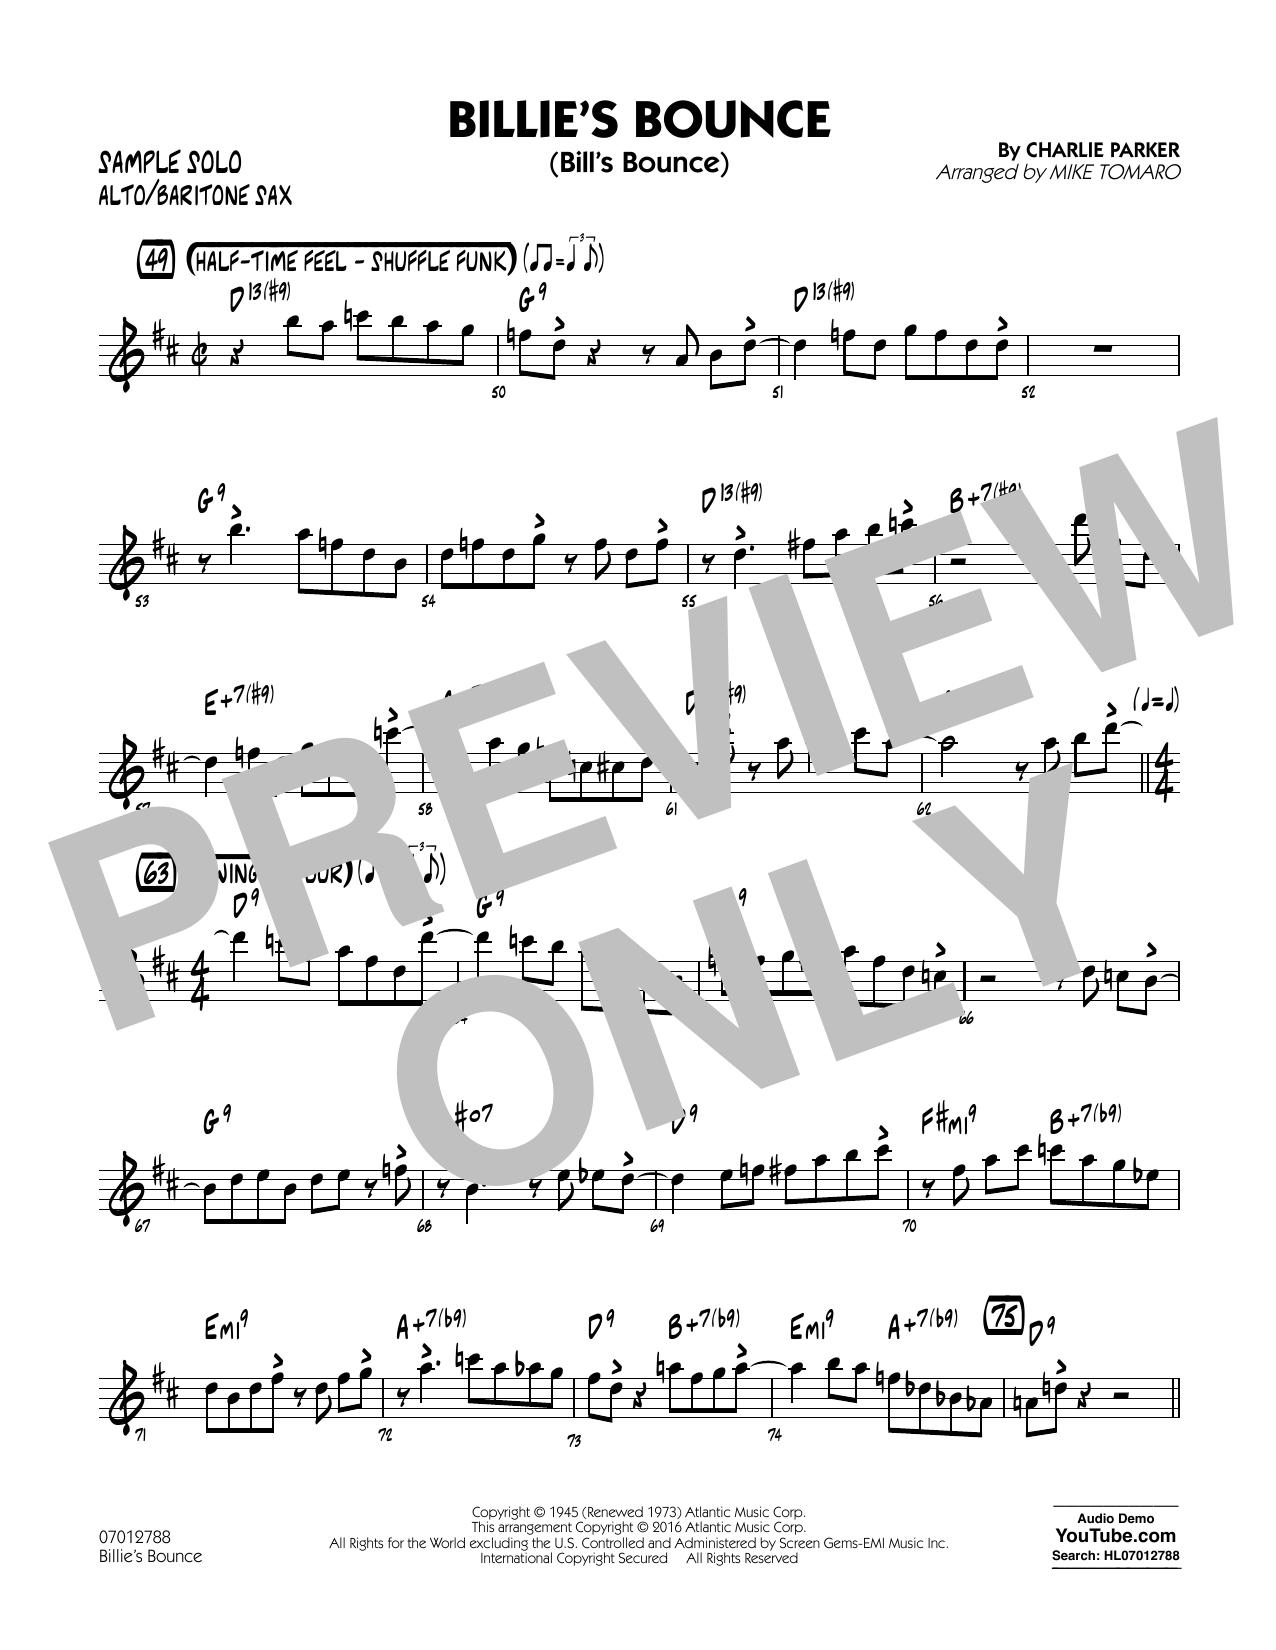 Billie's Bounce - Alto Sax/Bari Sax Sample Solo (Jazz Ensemble)